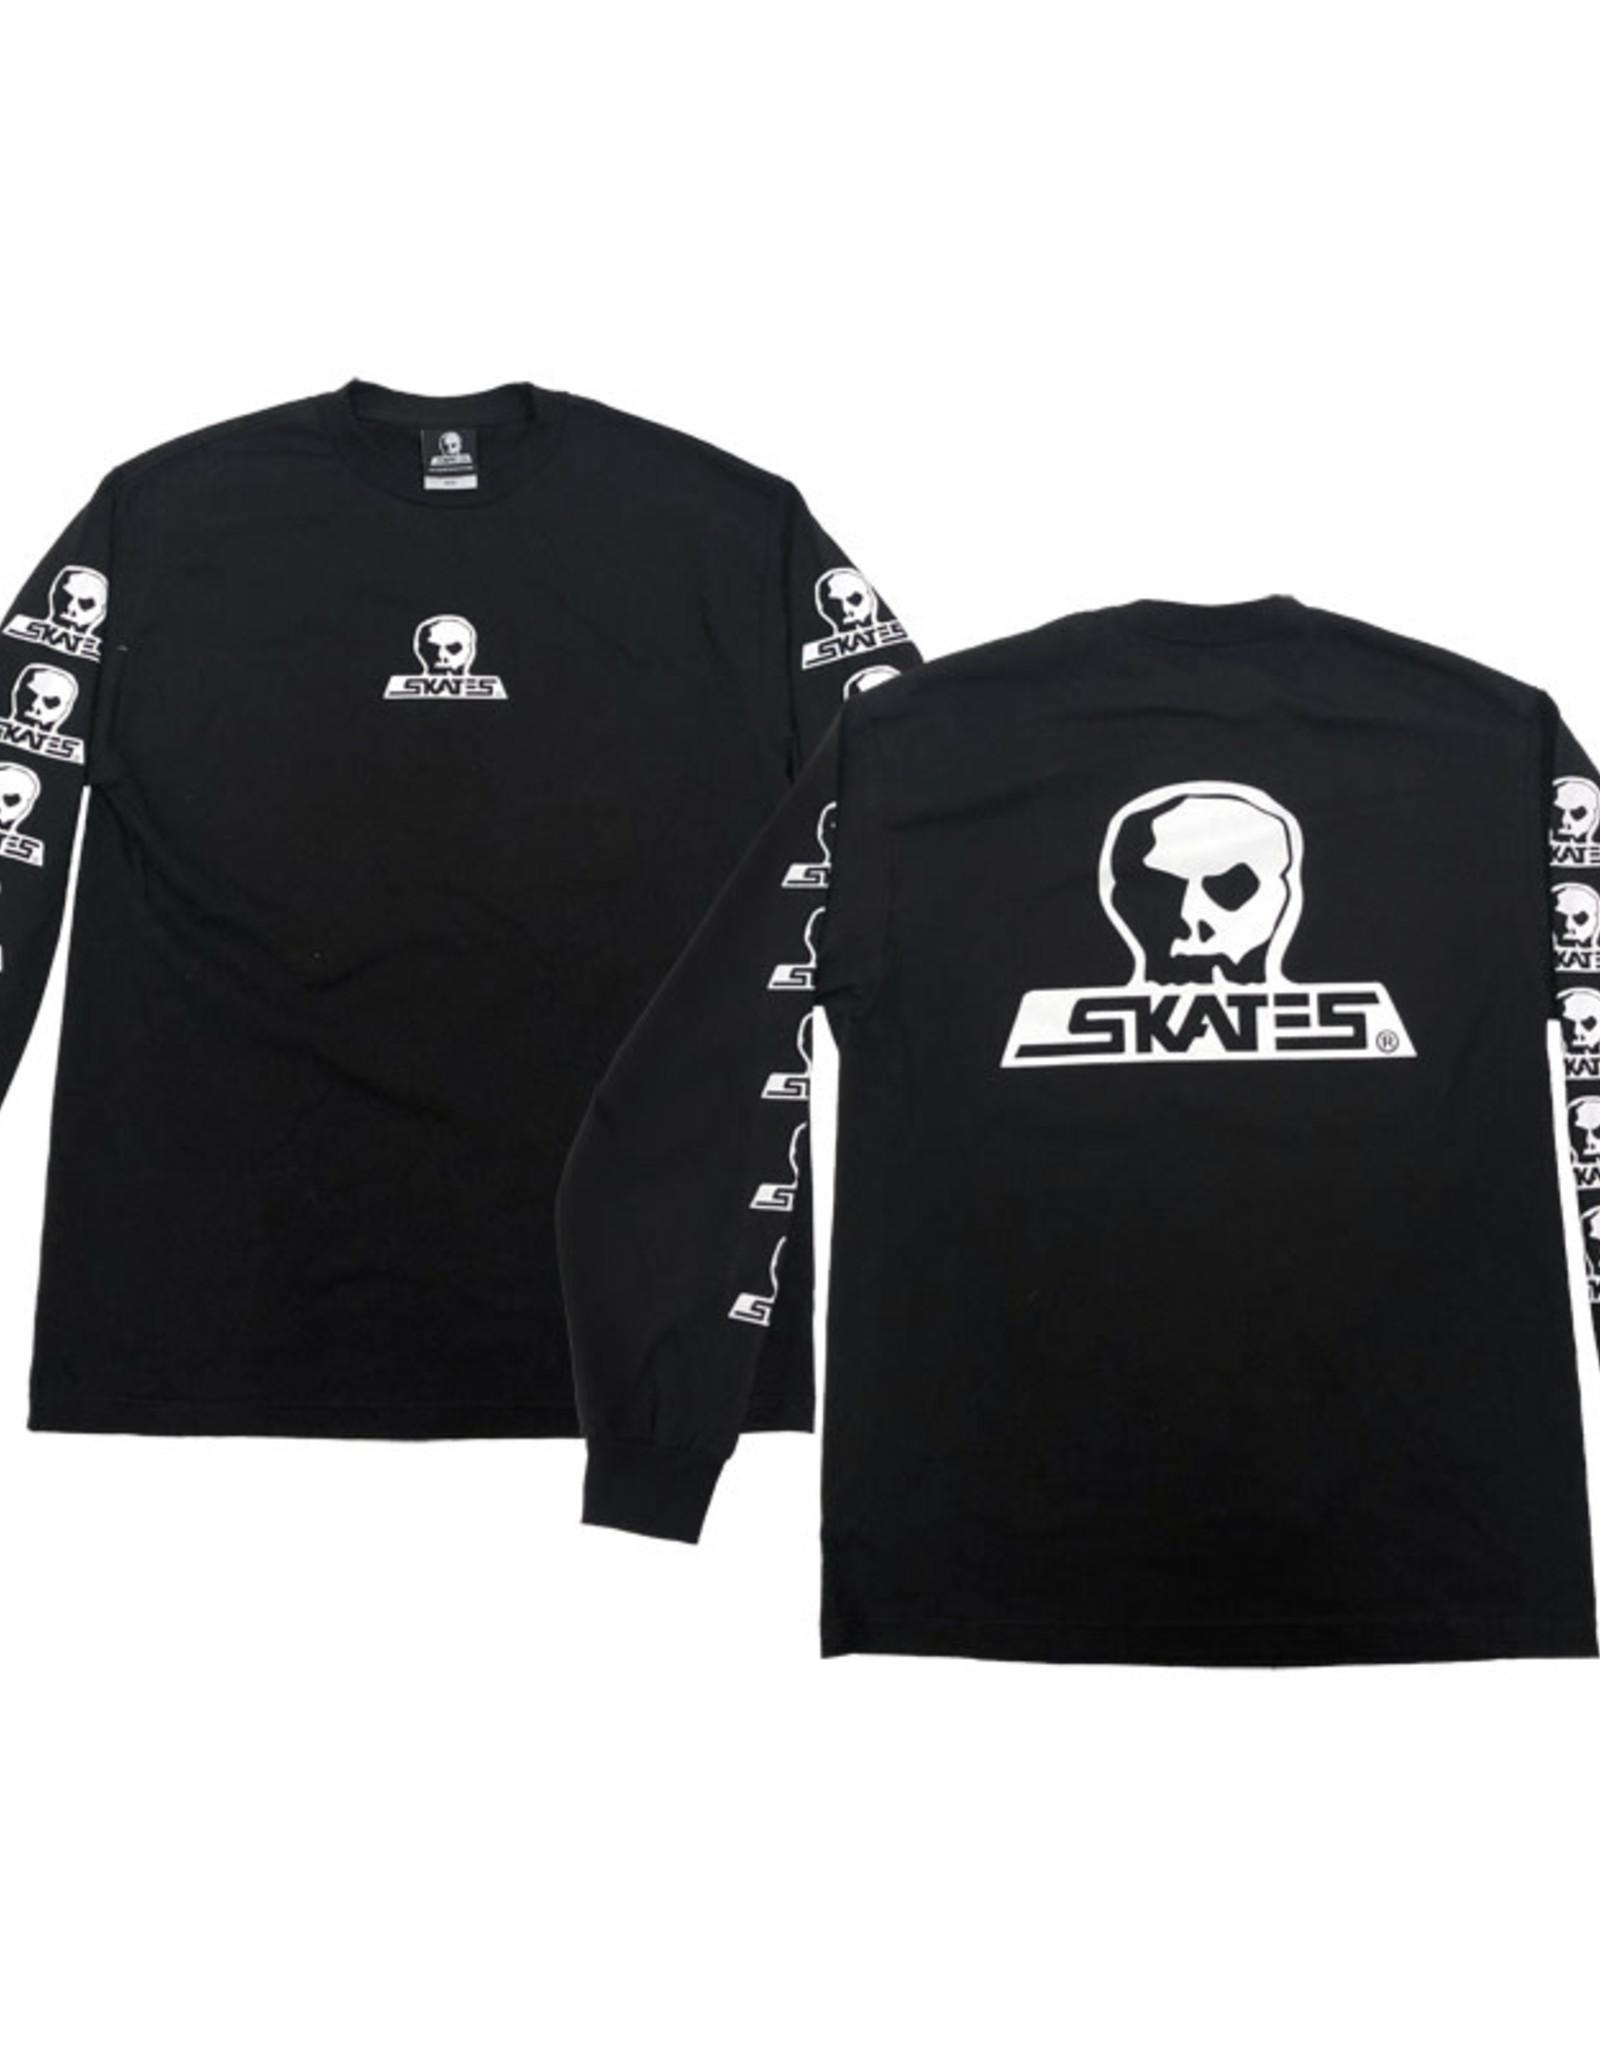 Skull Skates L/S T-SHIRT SKULL LOGO